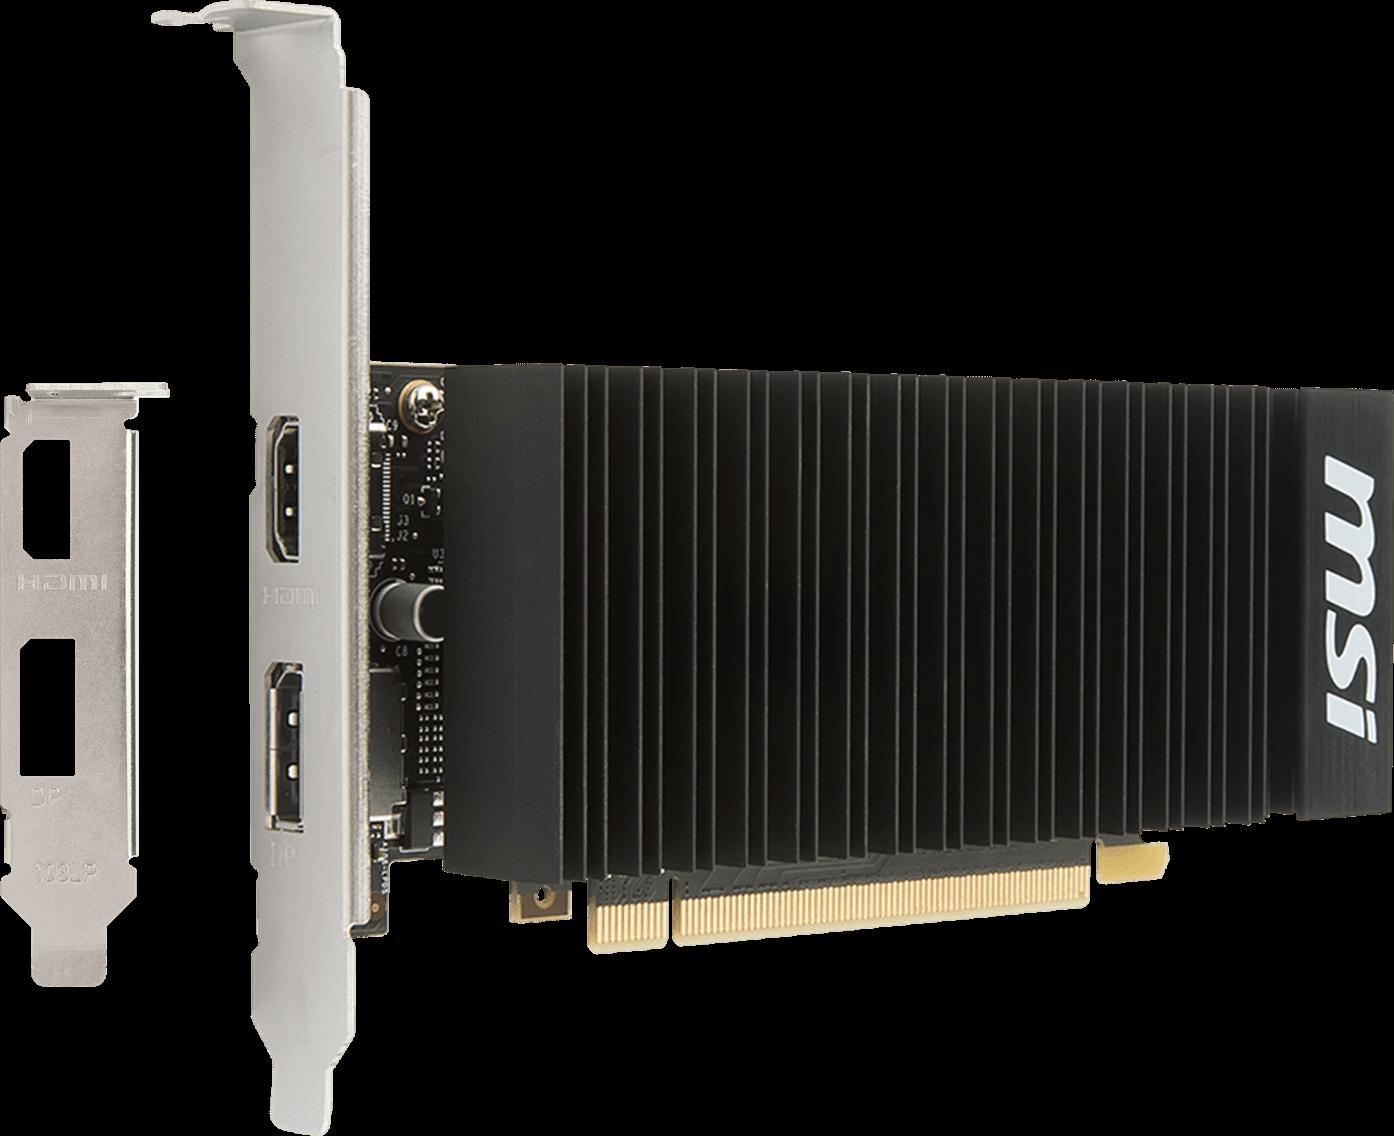 MSI GeForce GT 1030 HDMI/DisplayPort - passiv - super silent